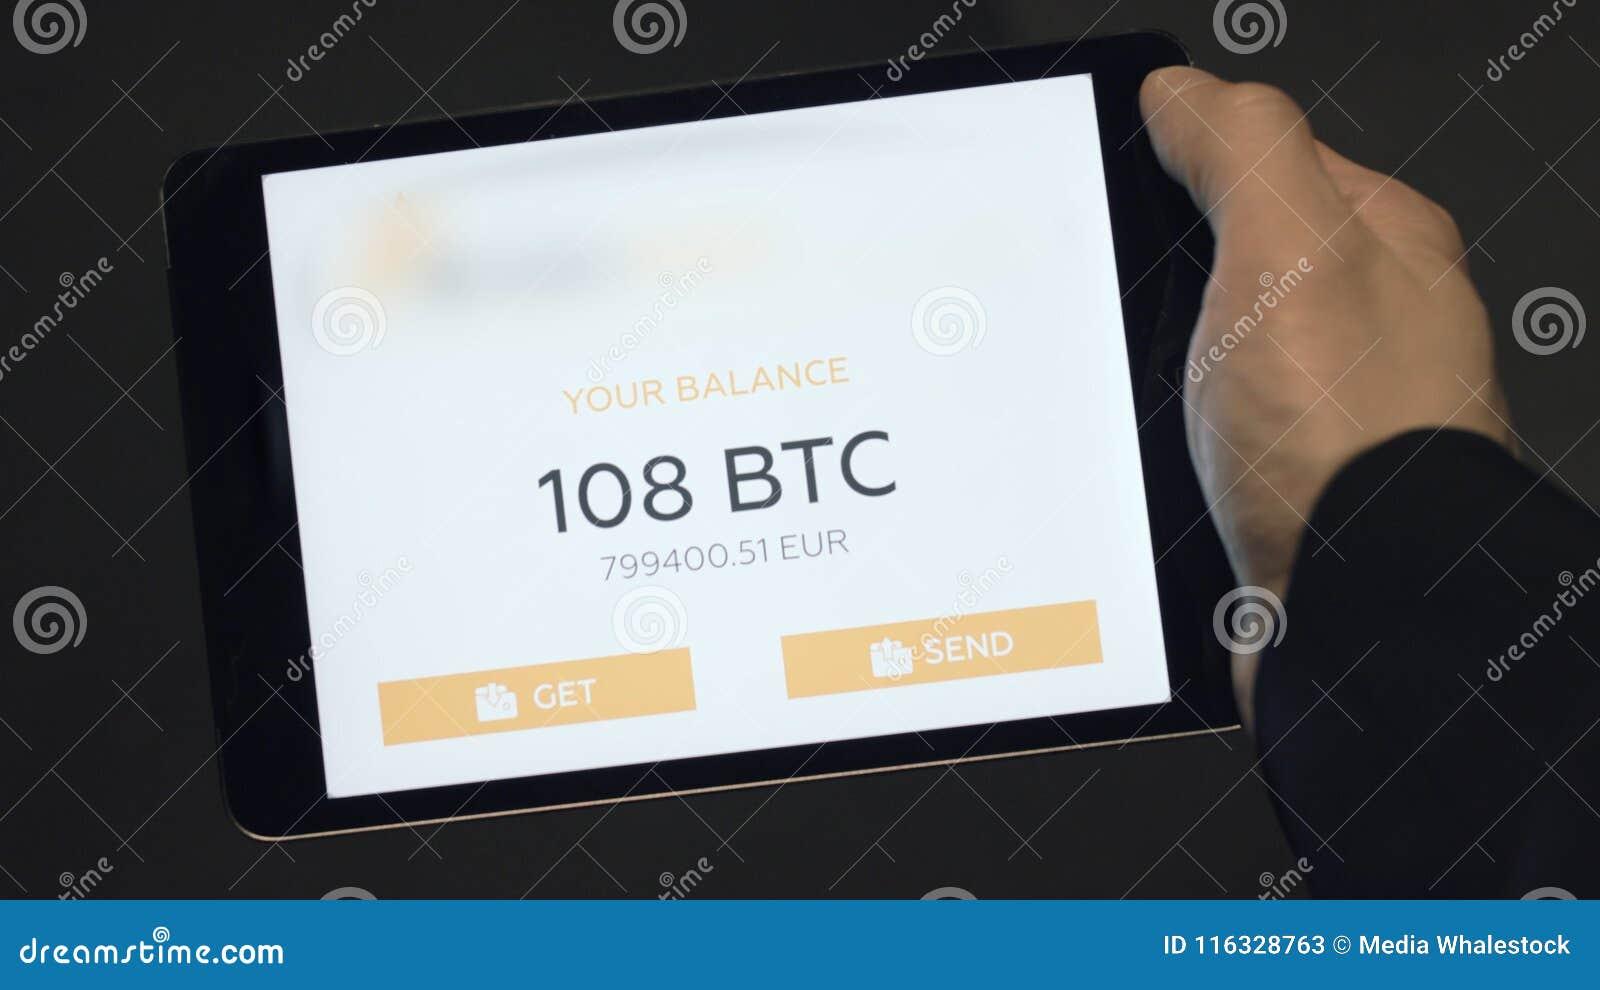 bitcoin wallet free bitcoins